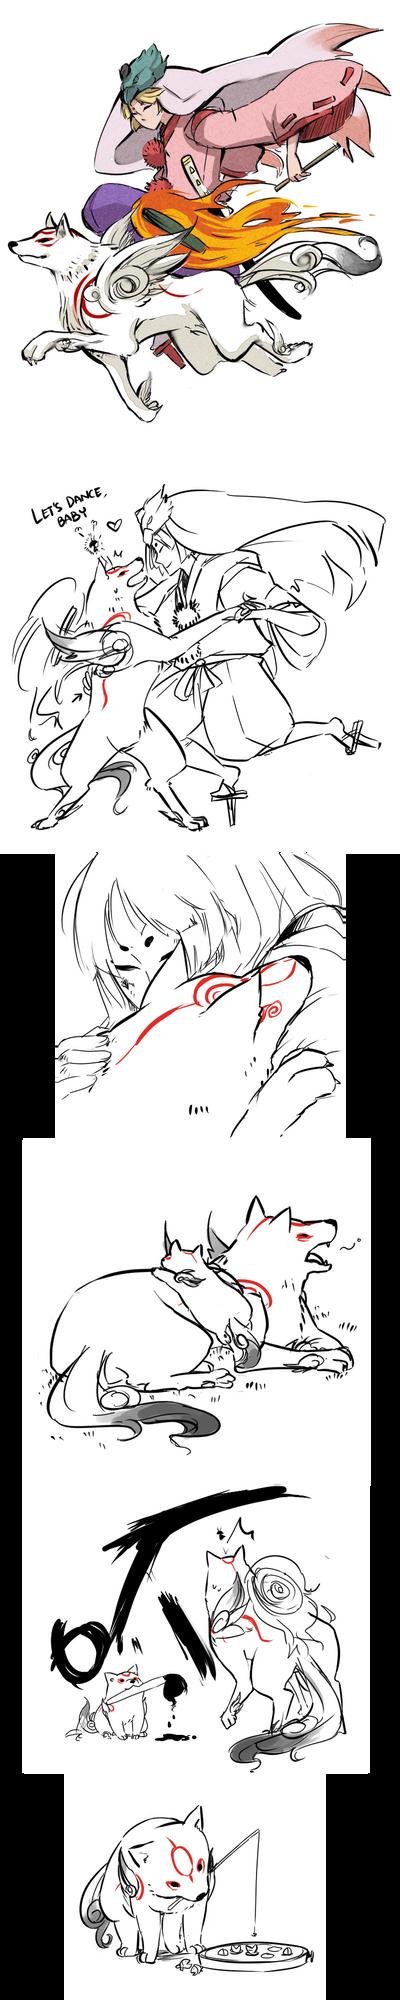 Okami+Okamiden by ryo-hakkai